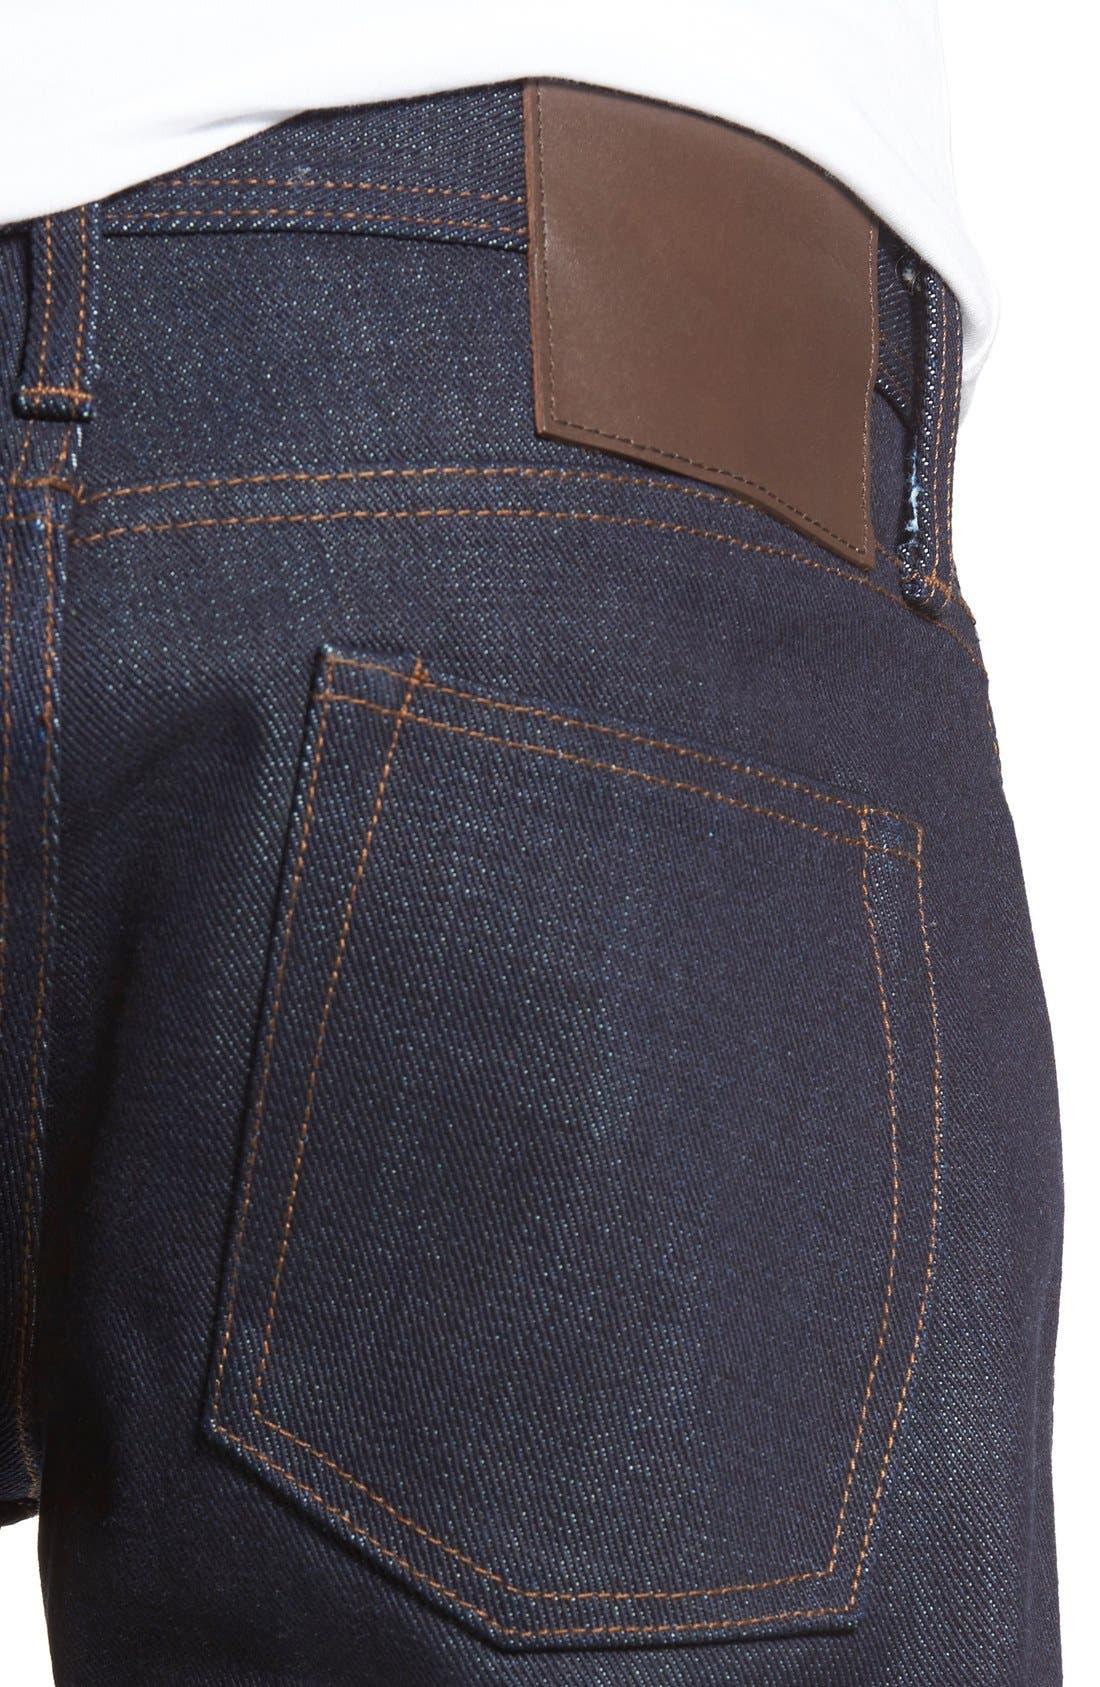 UB121 Selvedge Skinny Fit Jeans,                             Alternate thumbnail 4, color,                             401